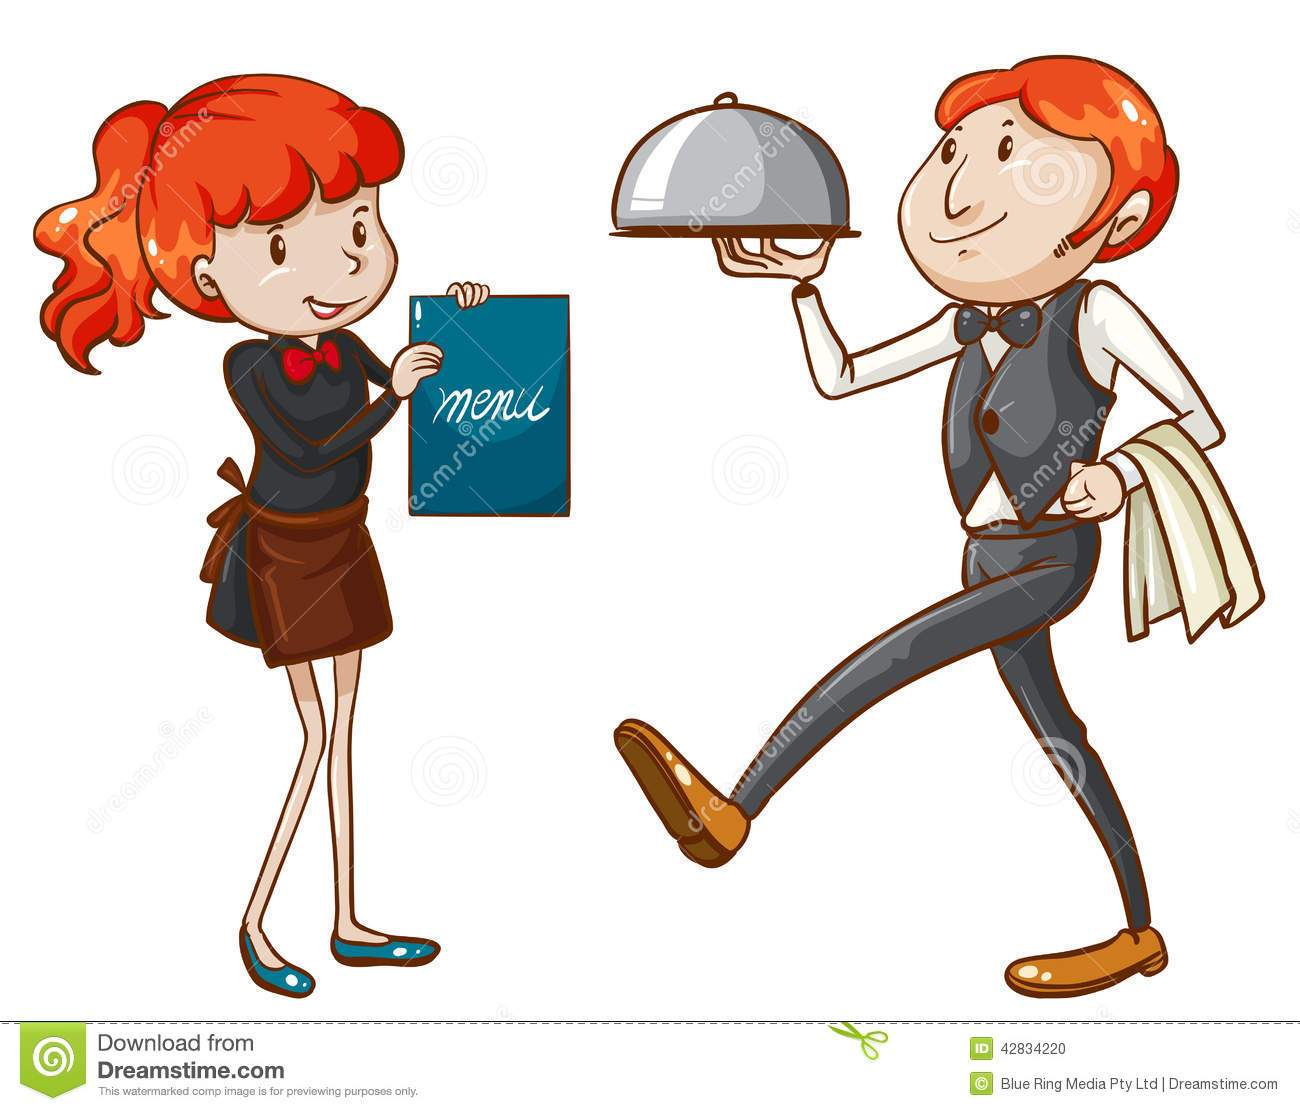 Waiters and waitresses clipart image transparent Waiter and waitress clipart 7 » Clipart Portal image transparent